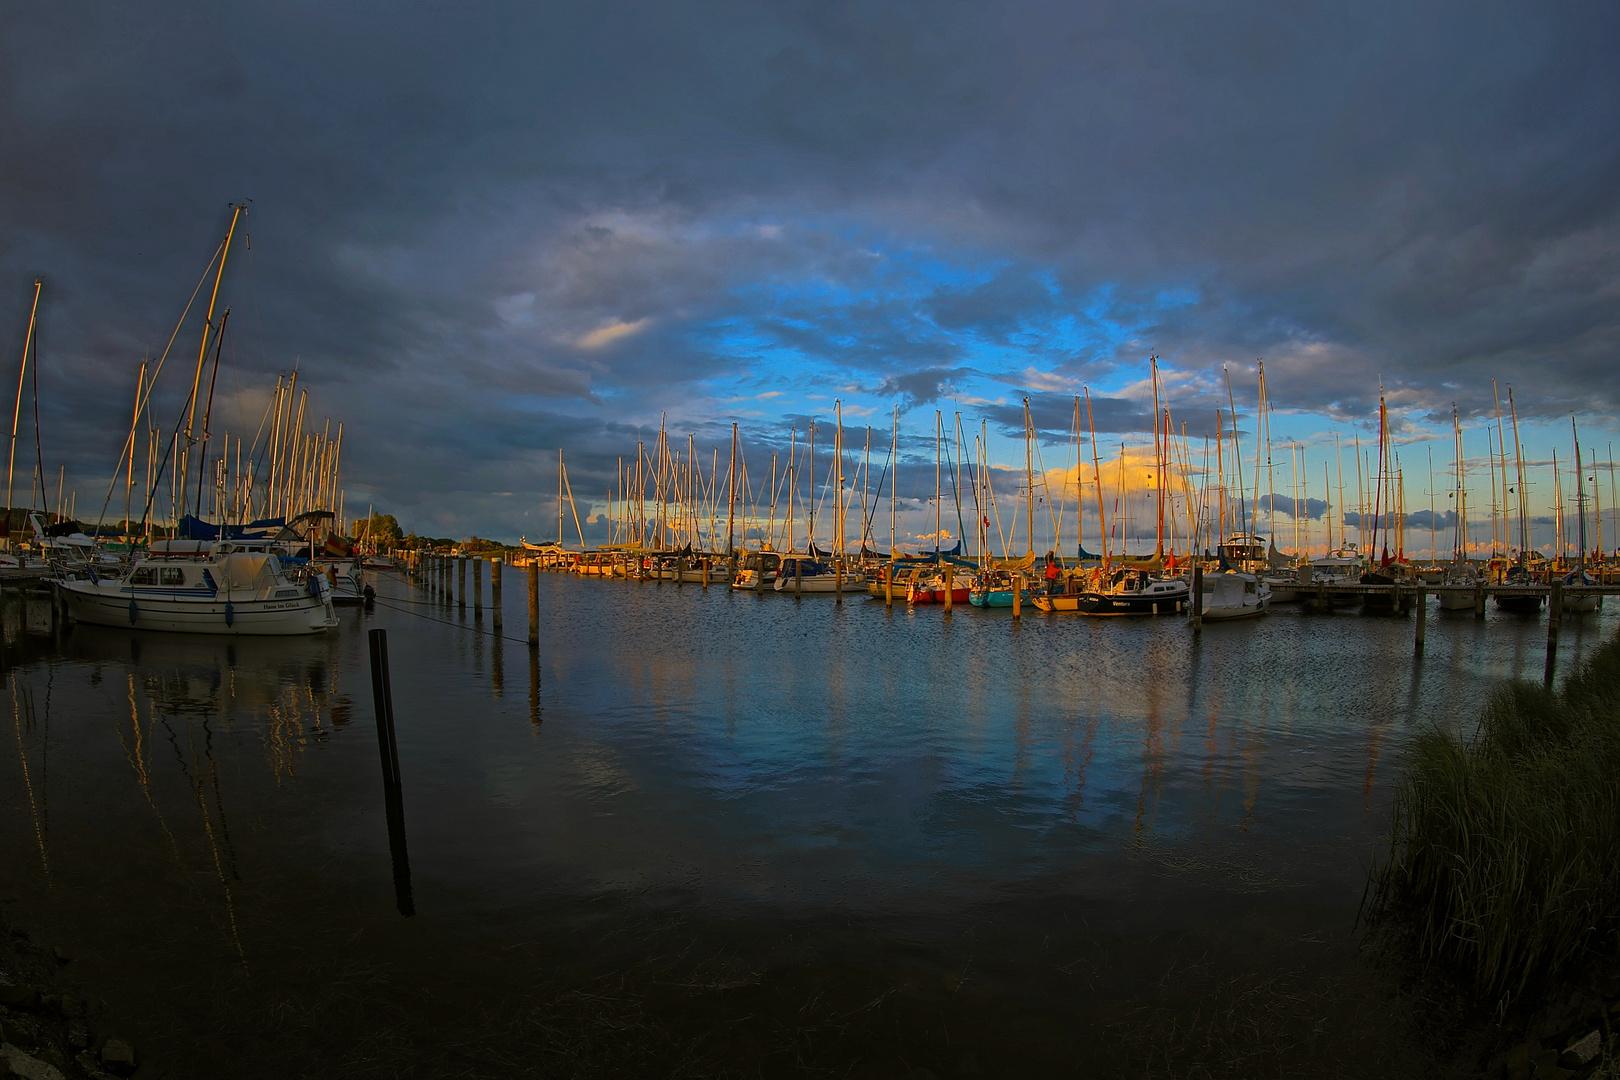 Seglerhafen Vitte/Hiddensee